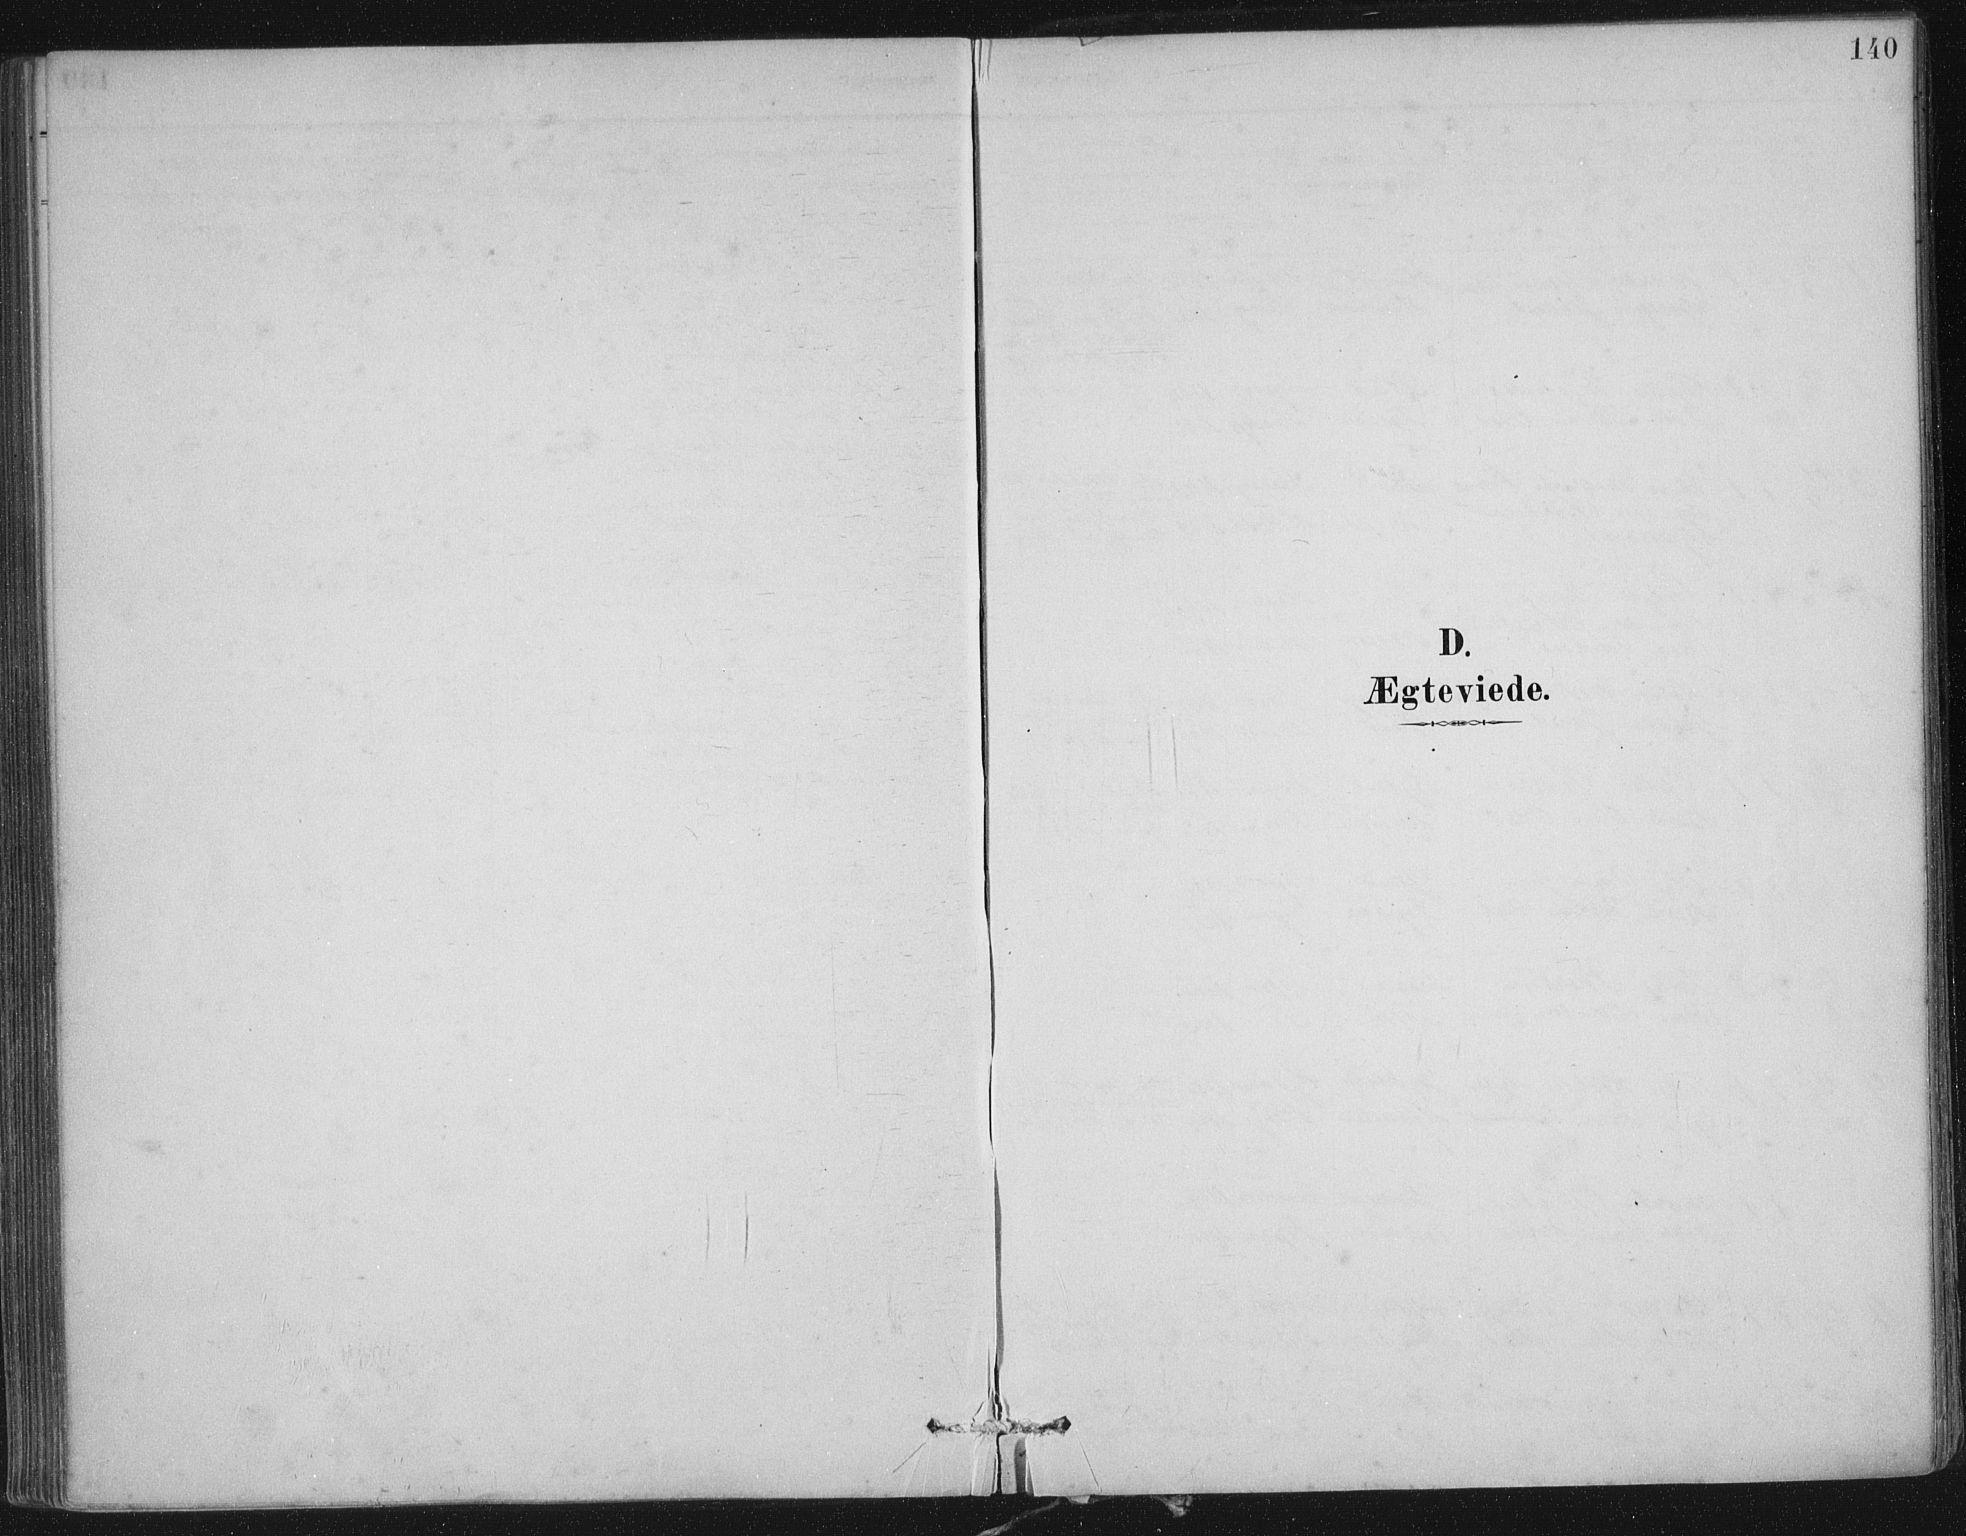 SAST, Nedstrand sokneprestkontor, IV: Ministerialbok nr. A 12, 1887-1915, s. 140